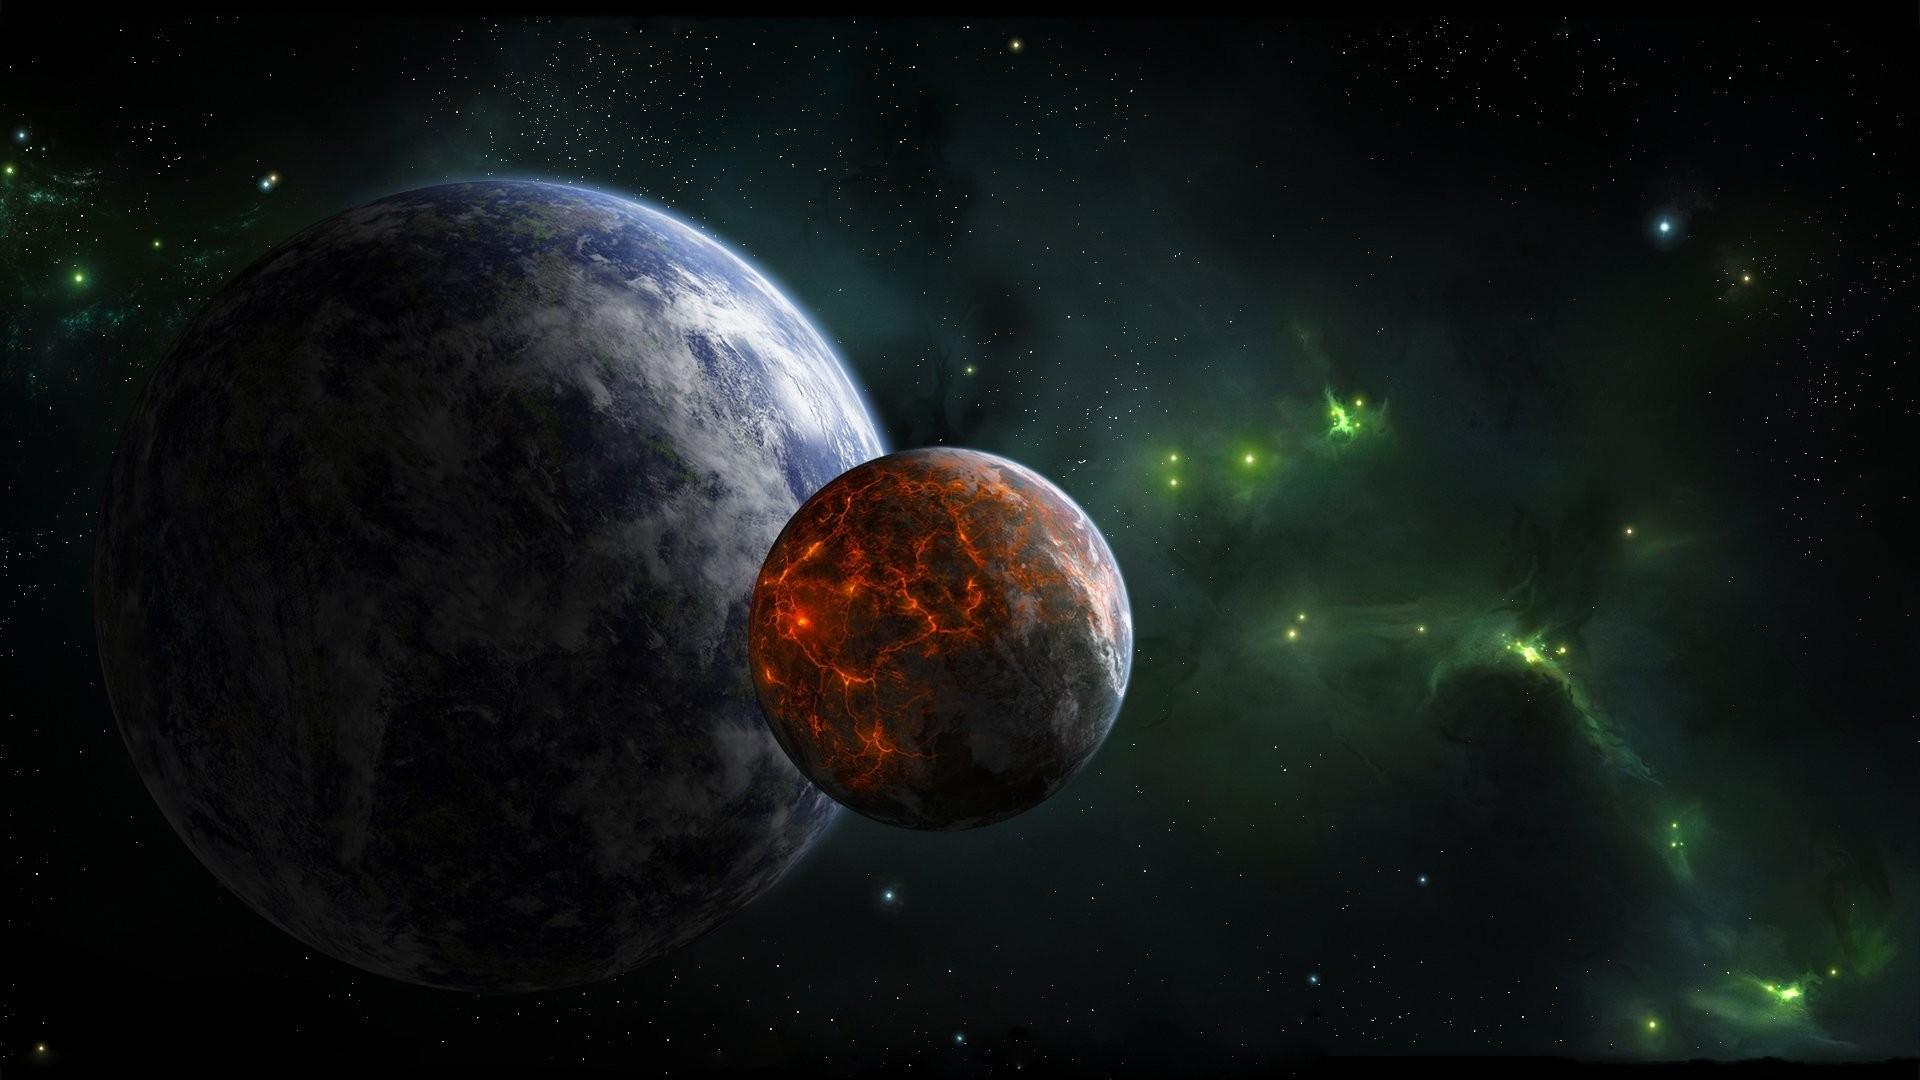 planet satellite volcanic activity star green nebula